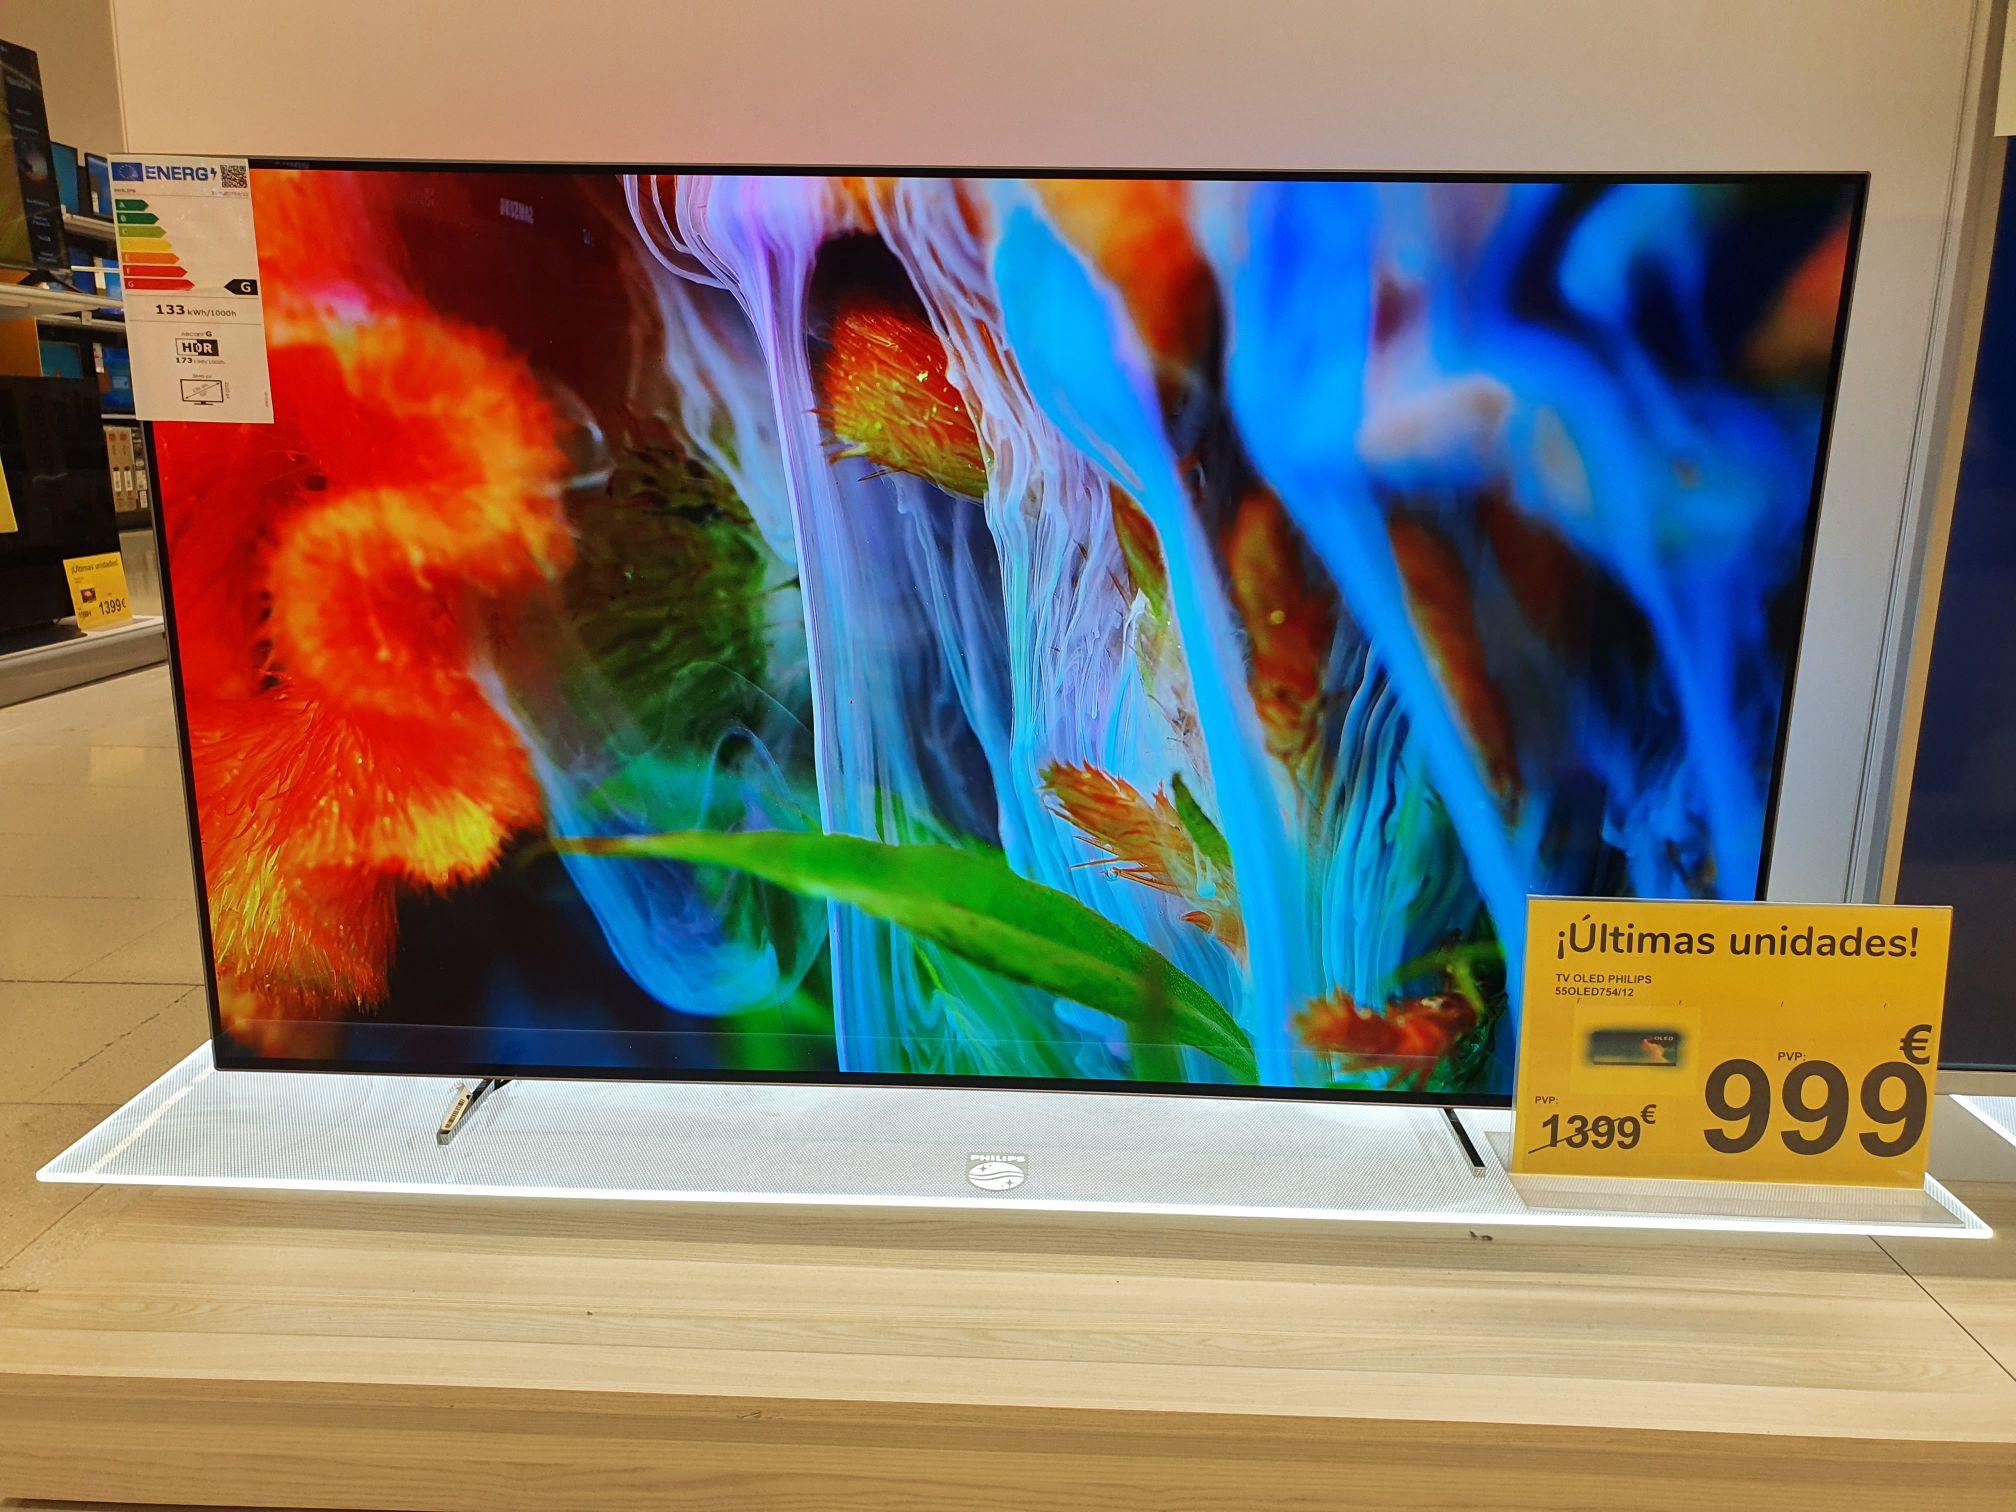 TV PHILIPS 55OLED754/12 (OLED - 55'' - 127 cm - 4K Ultra HD - Smart TV)